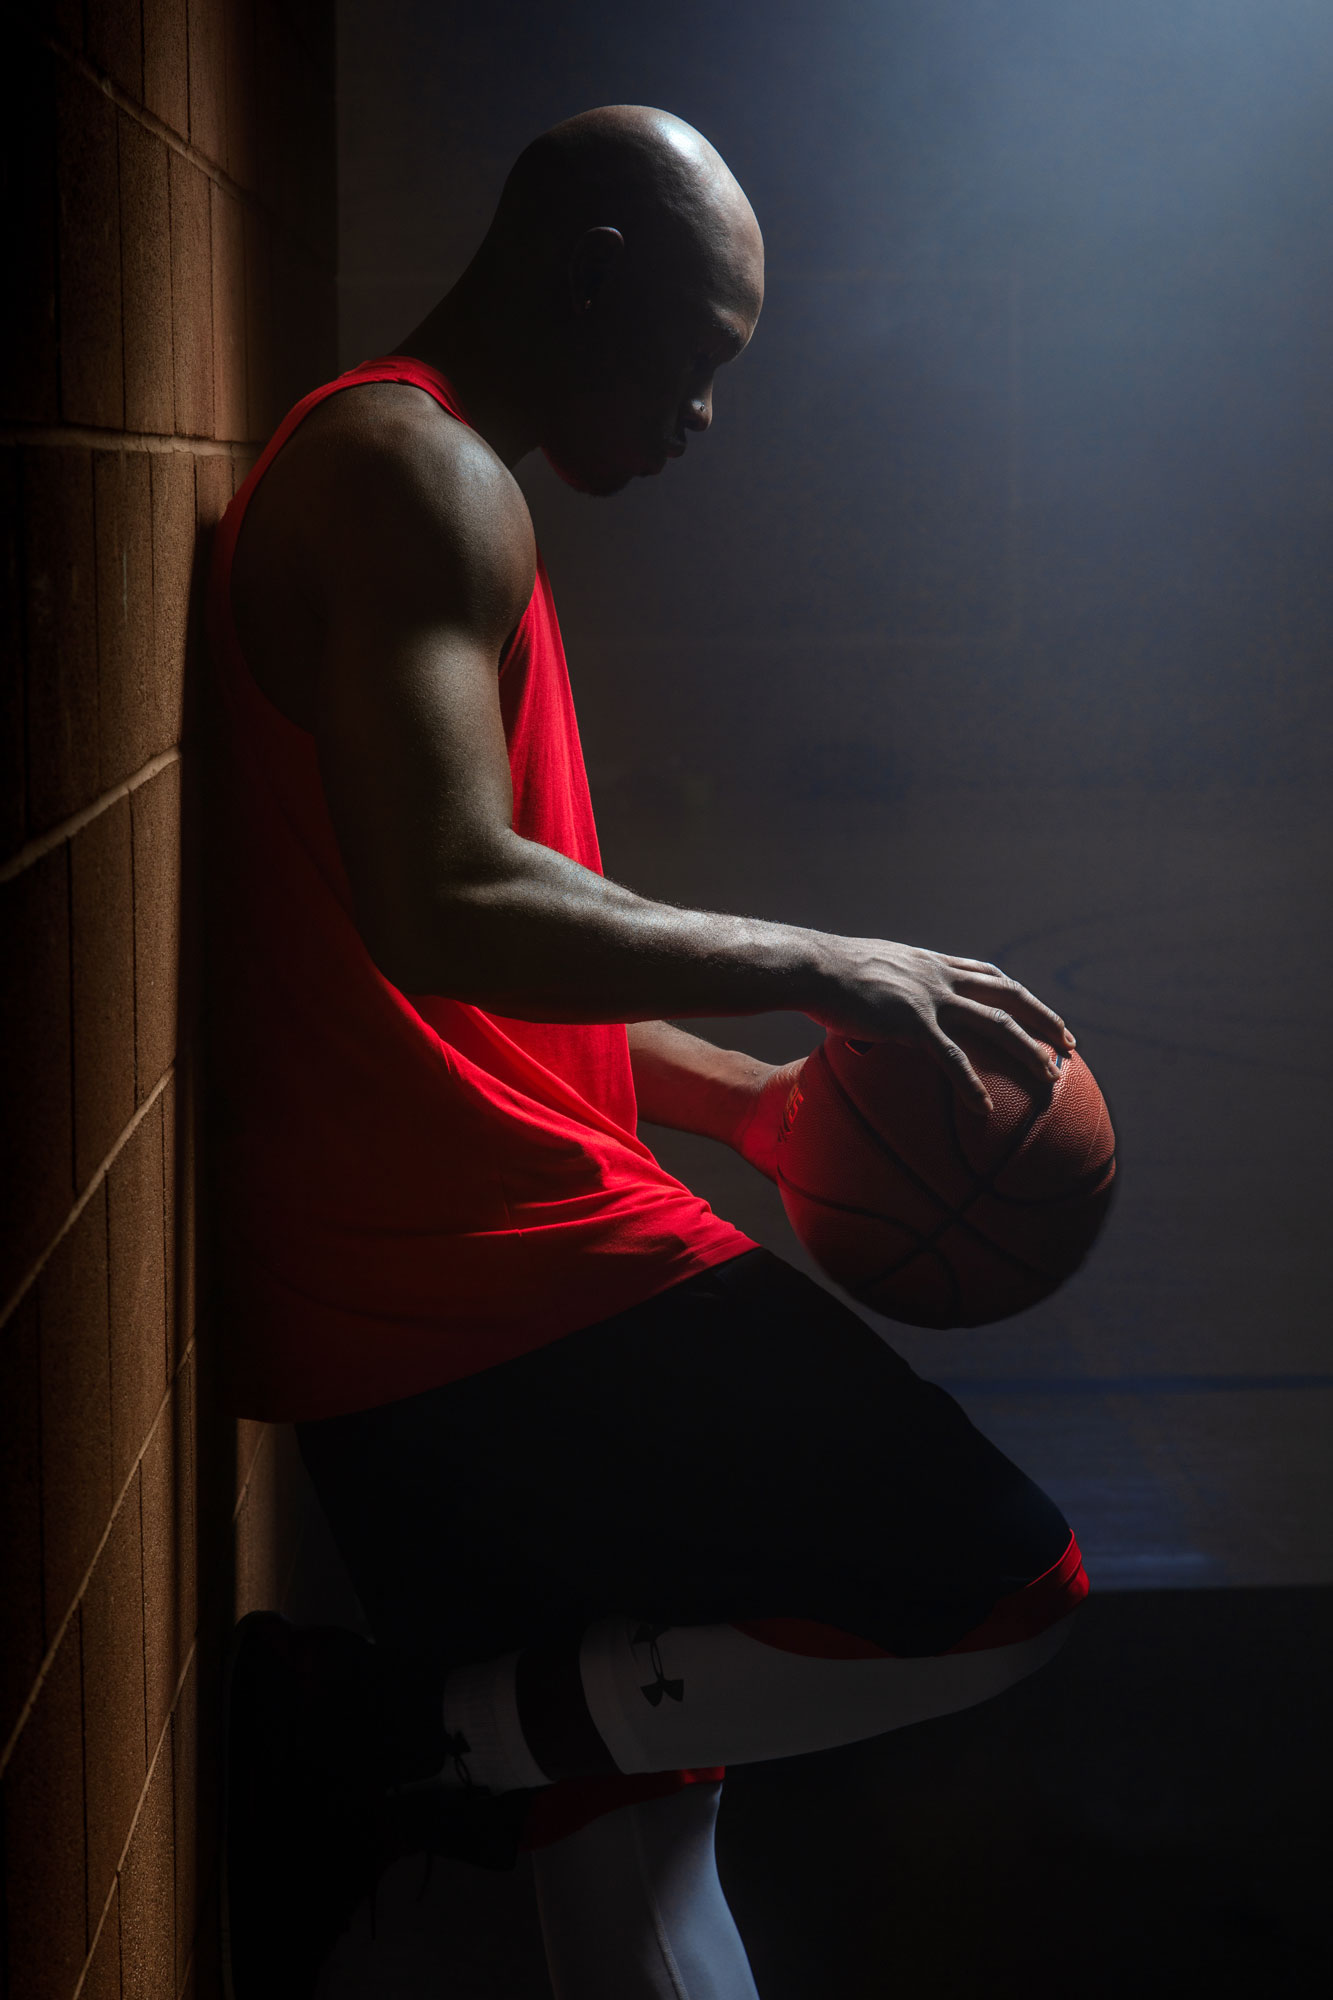 241-2018-07-03-Tyler-Basketball-Edit.jpg